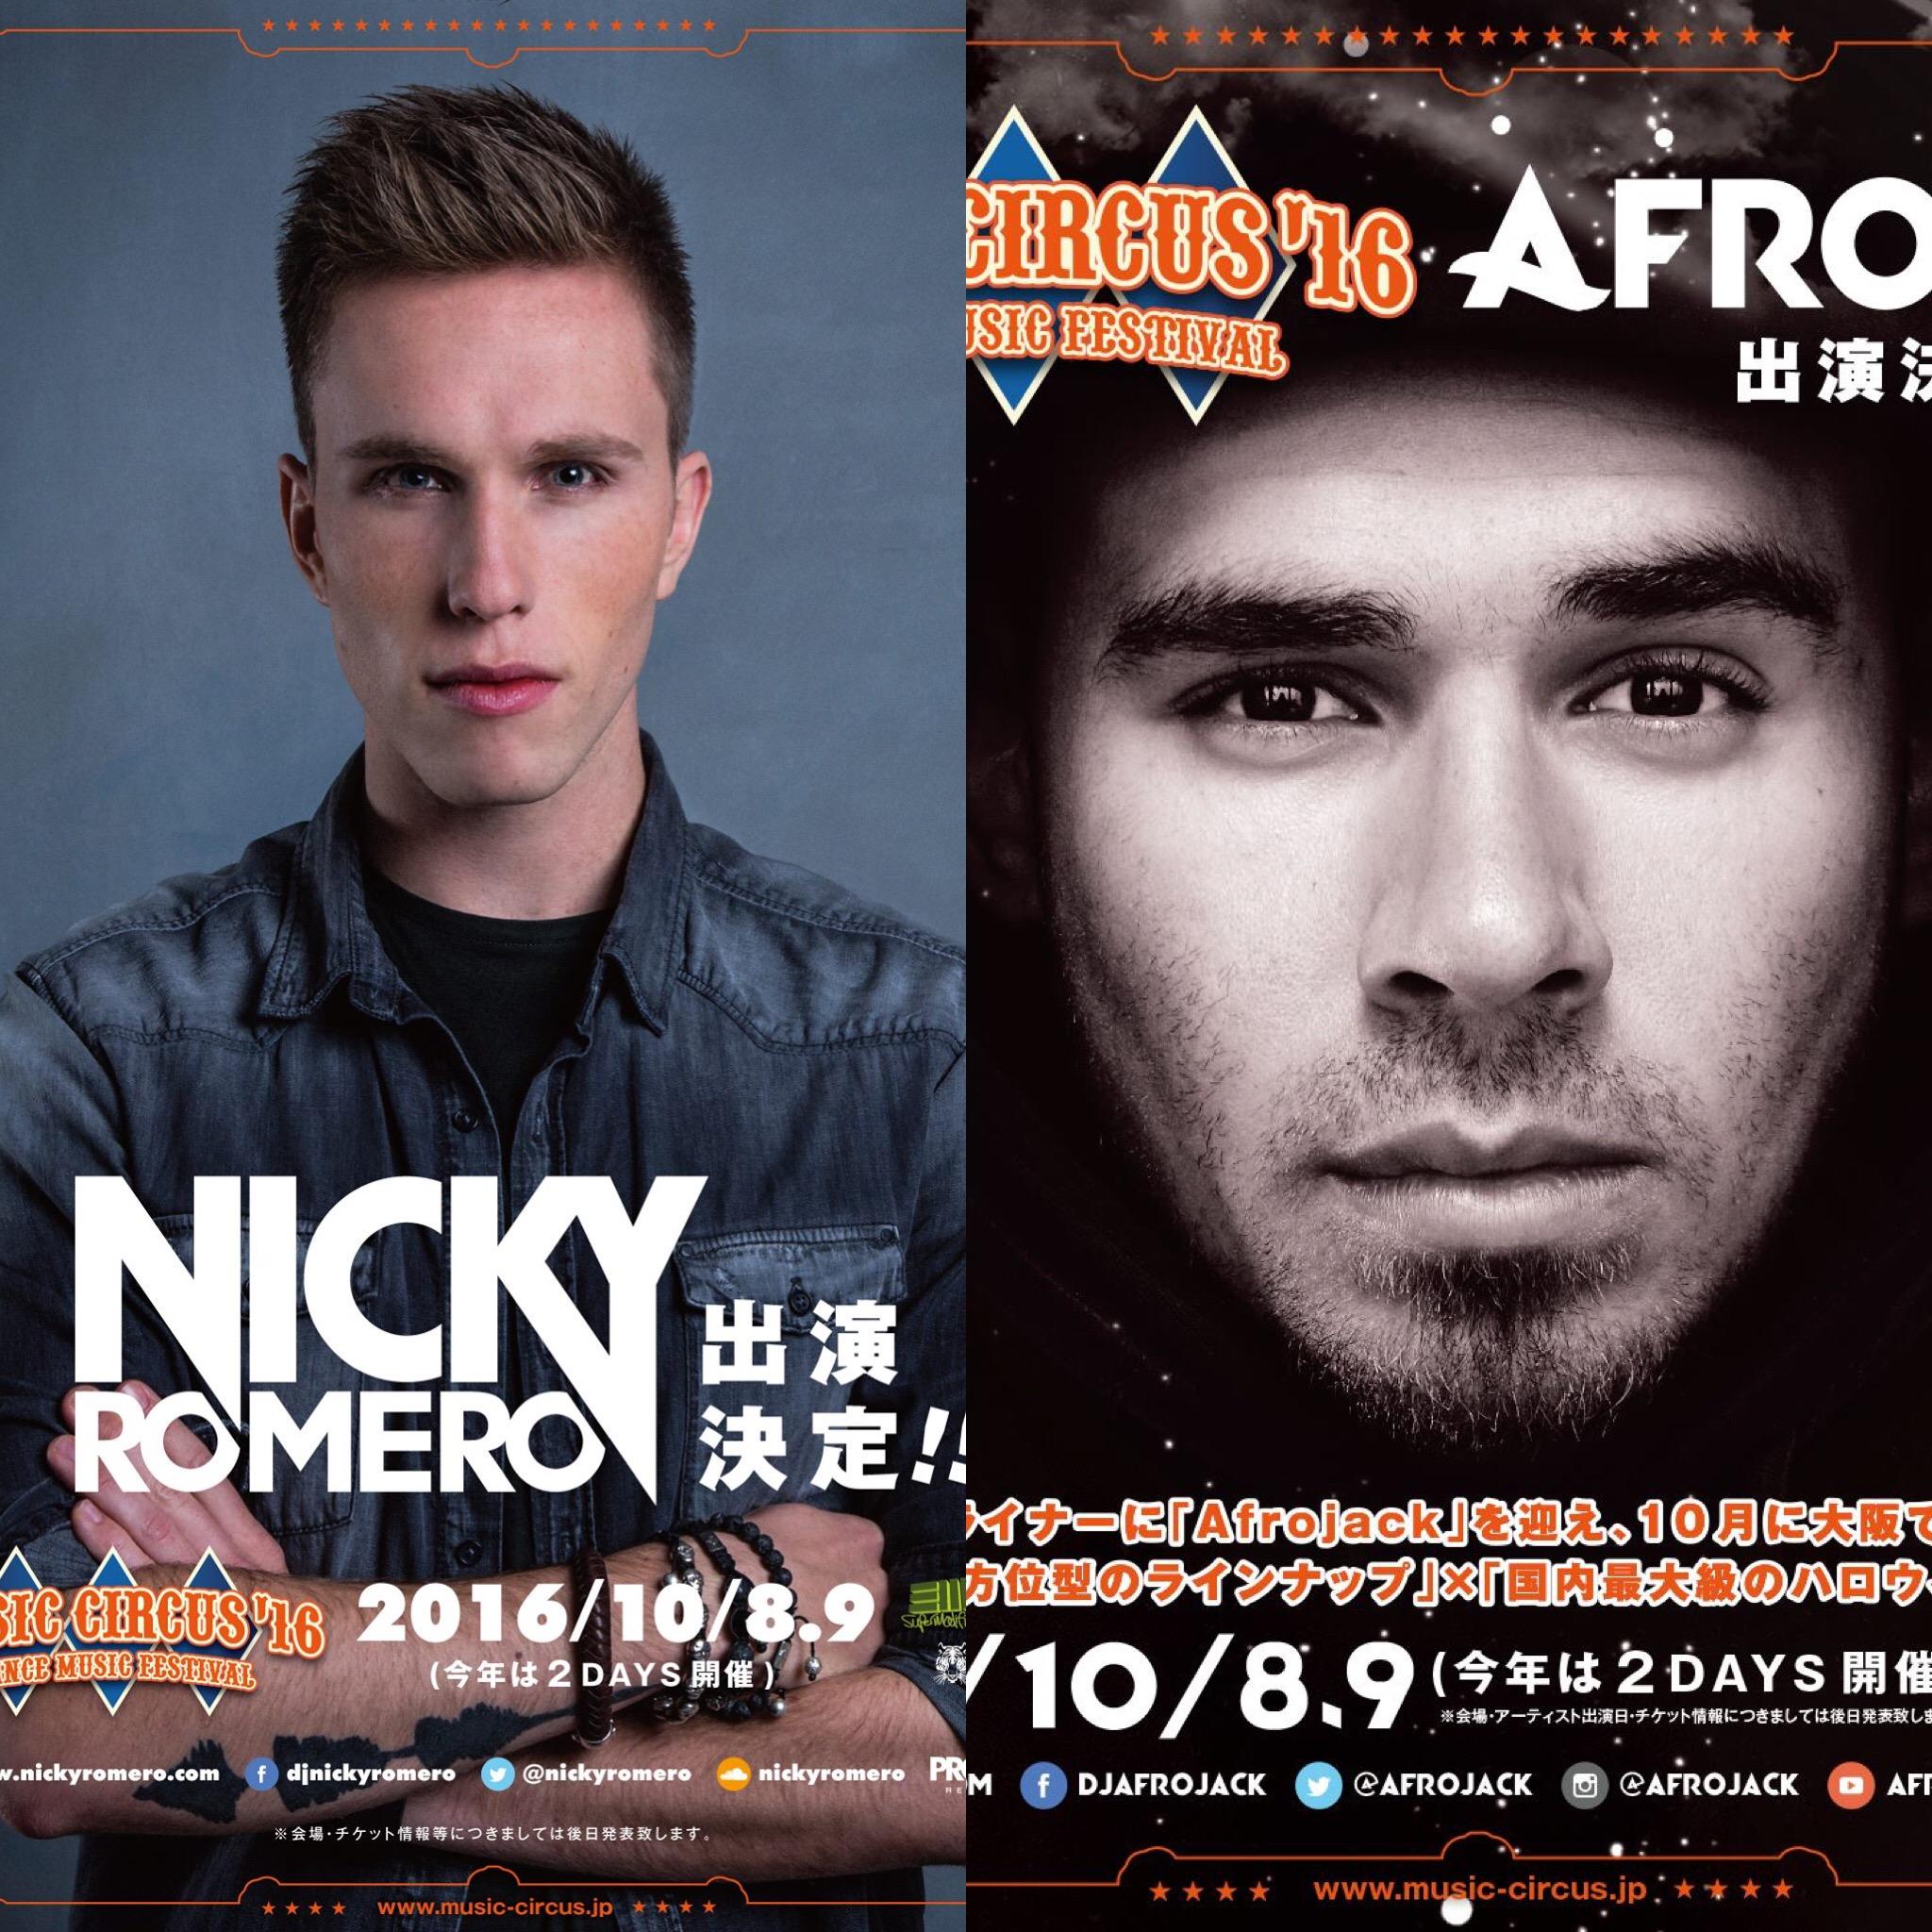 Nicky Romero Afrojack